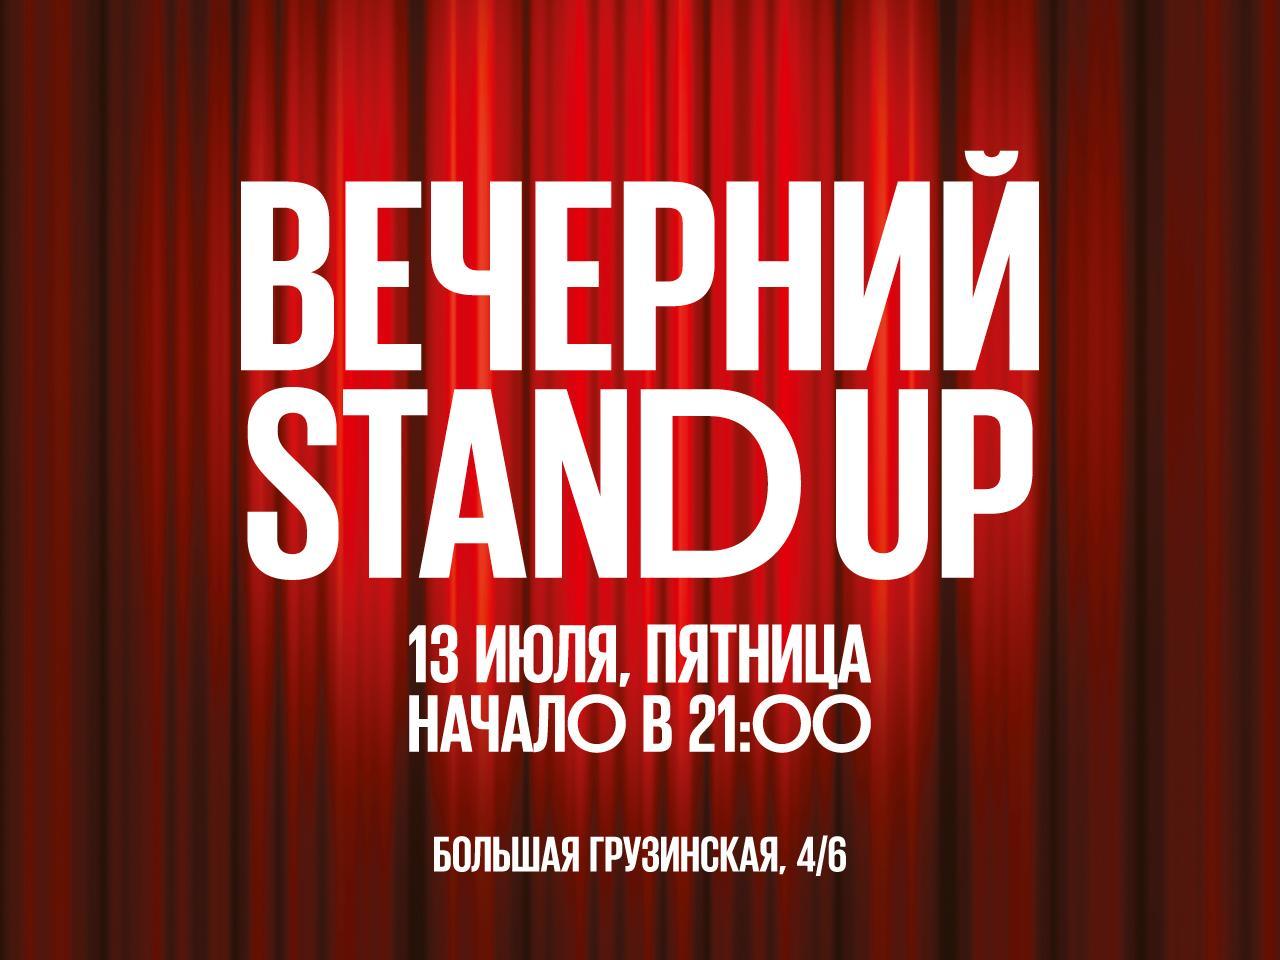 Вечерний Stand Up на Баррикадной